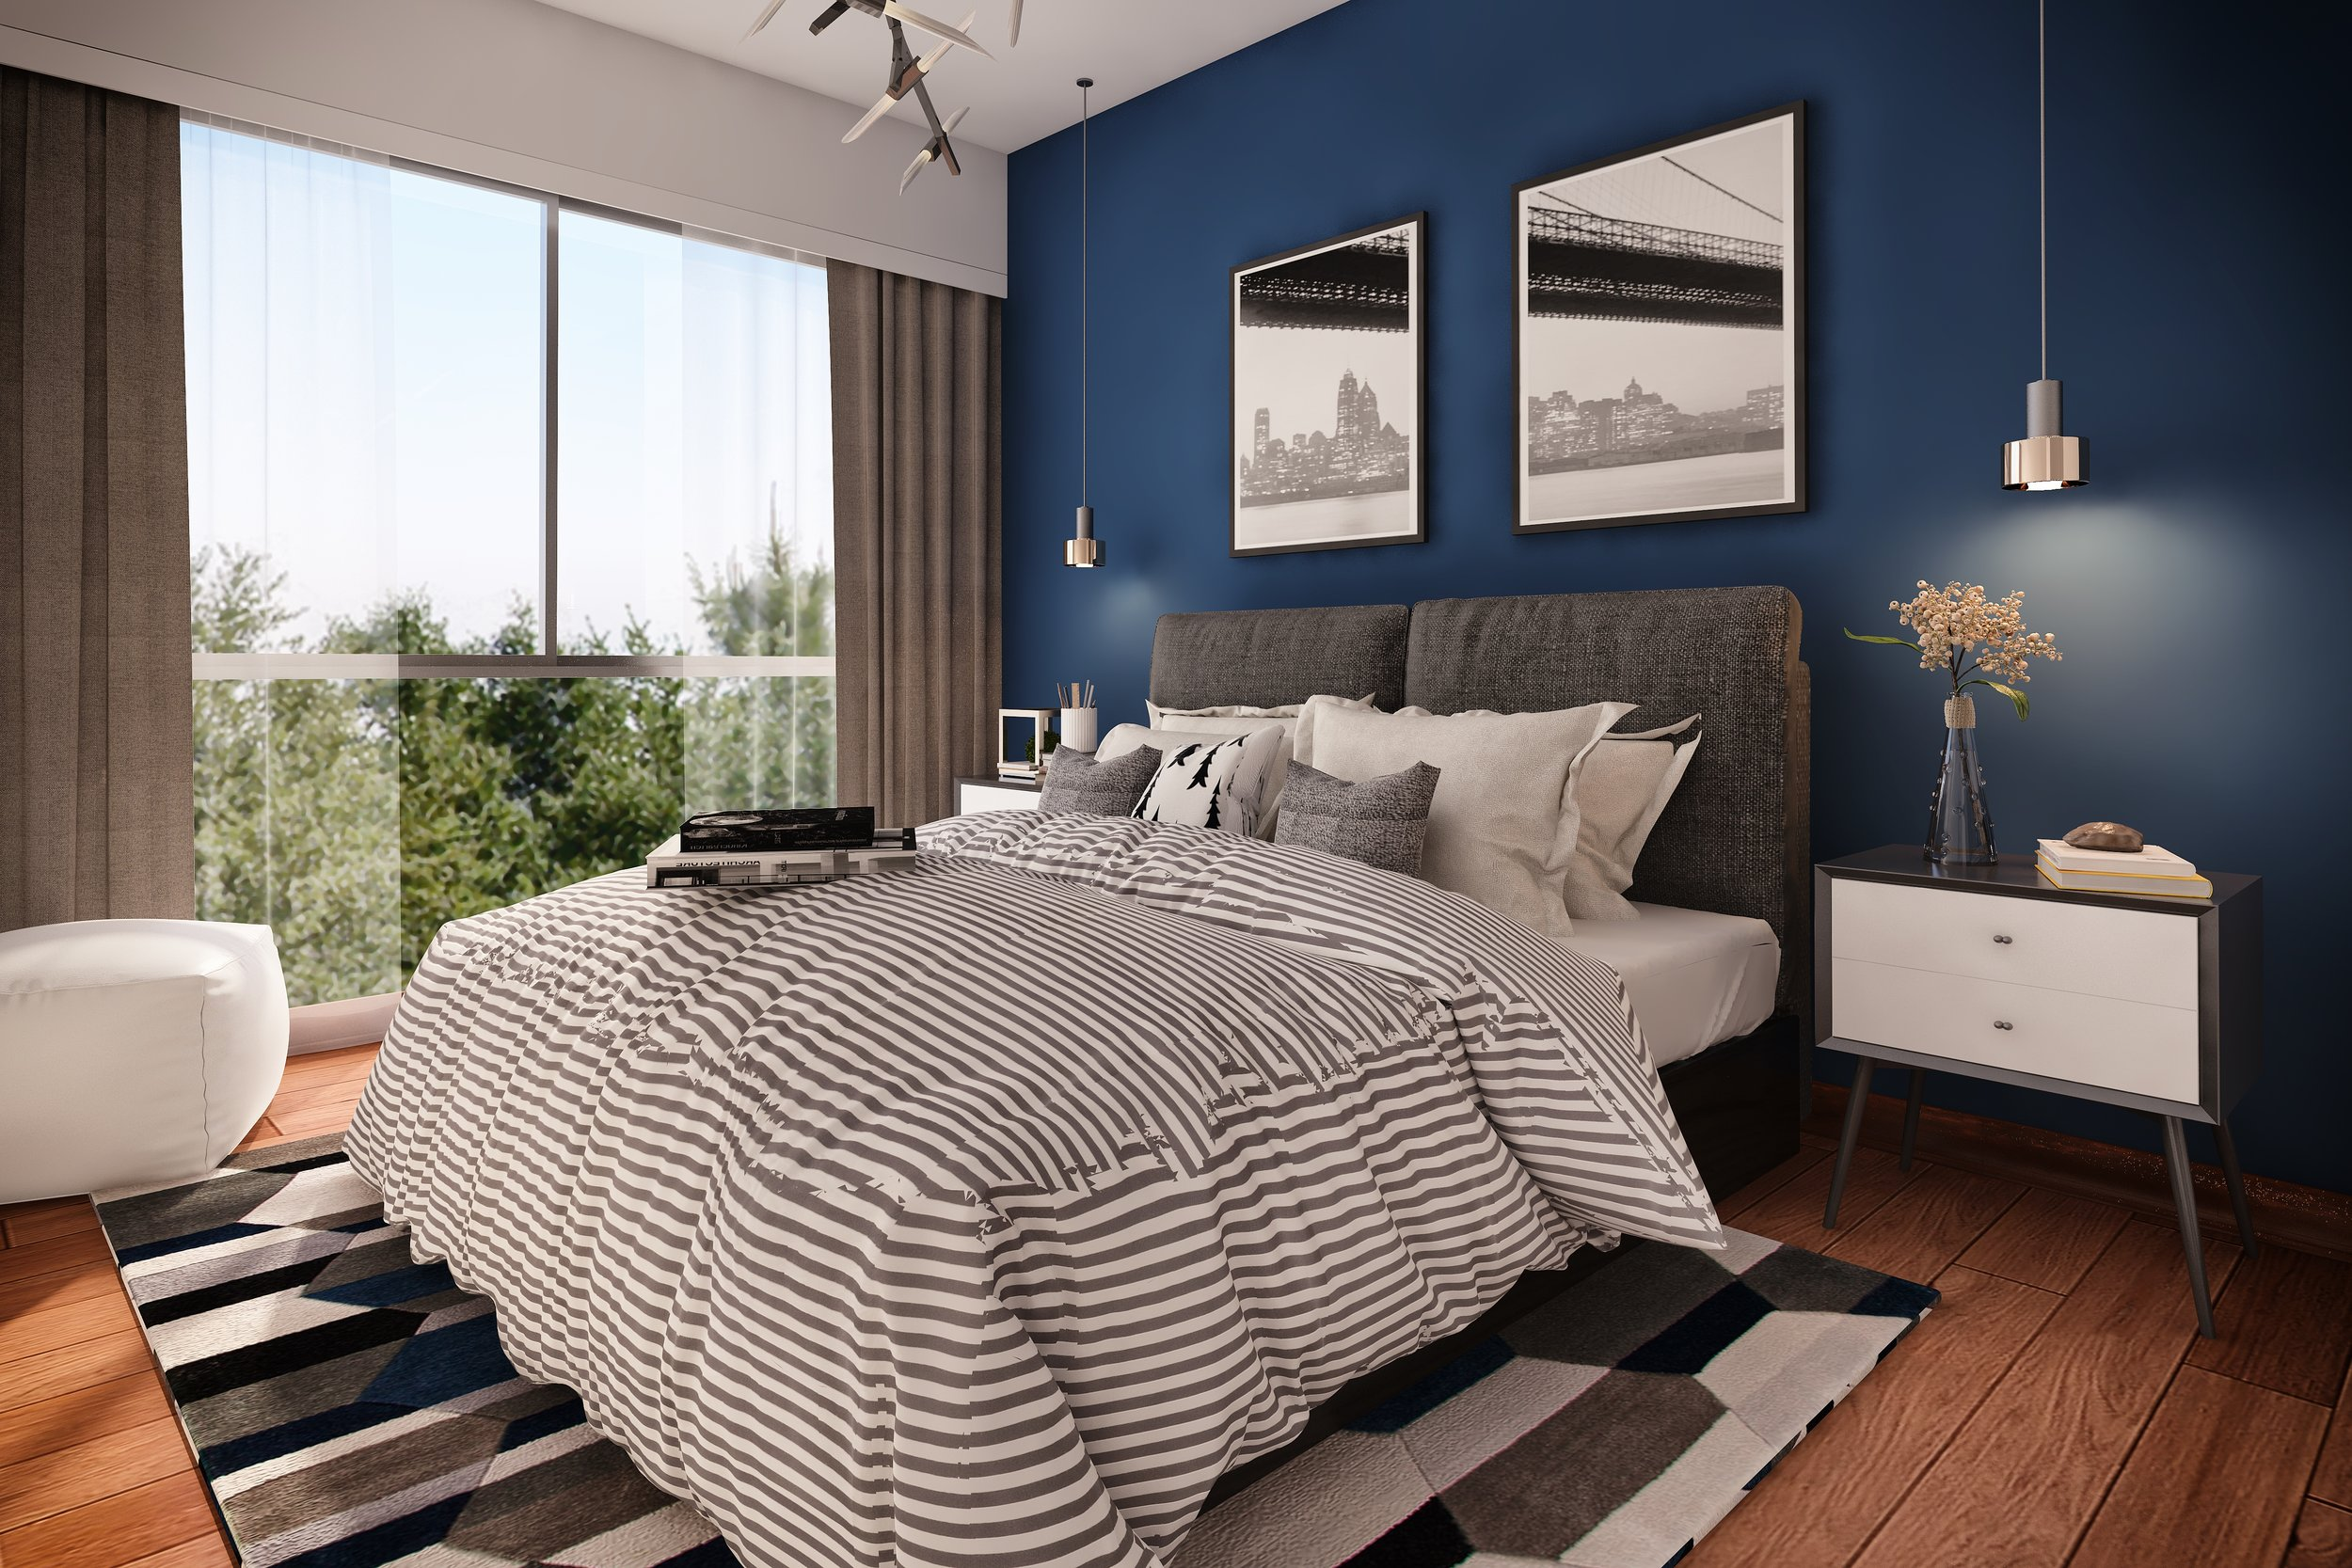 105-23 F1 LLZ Dormitorio X2 (4800x3200).jpg